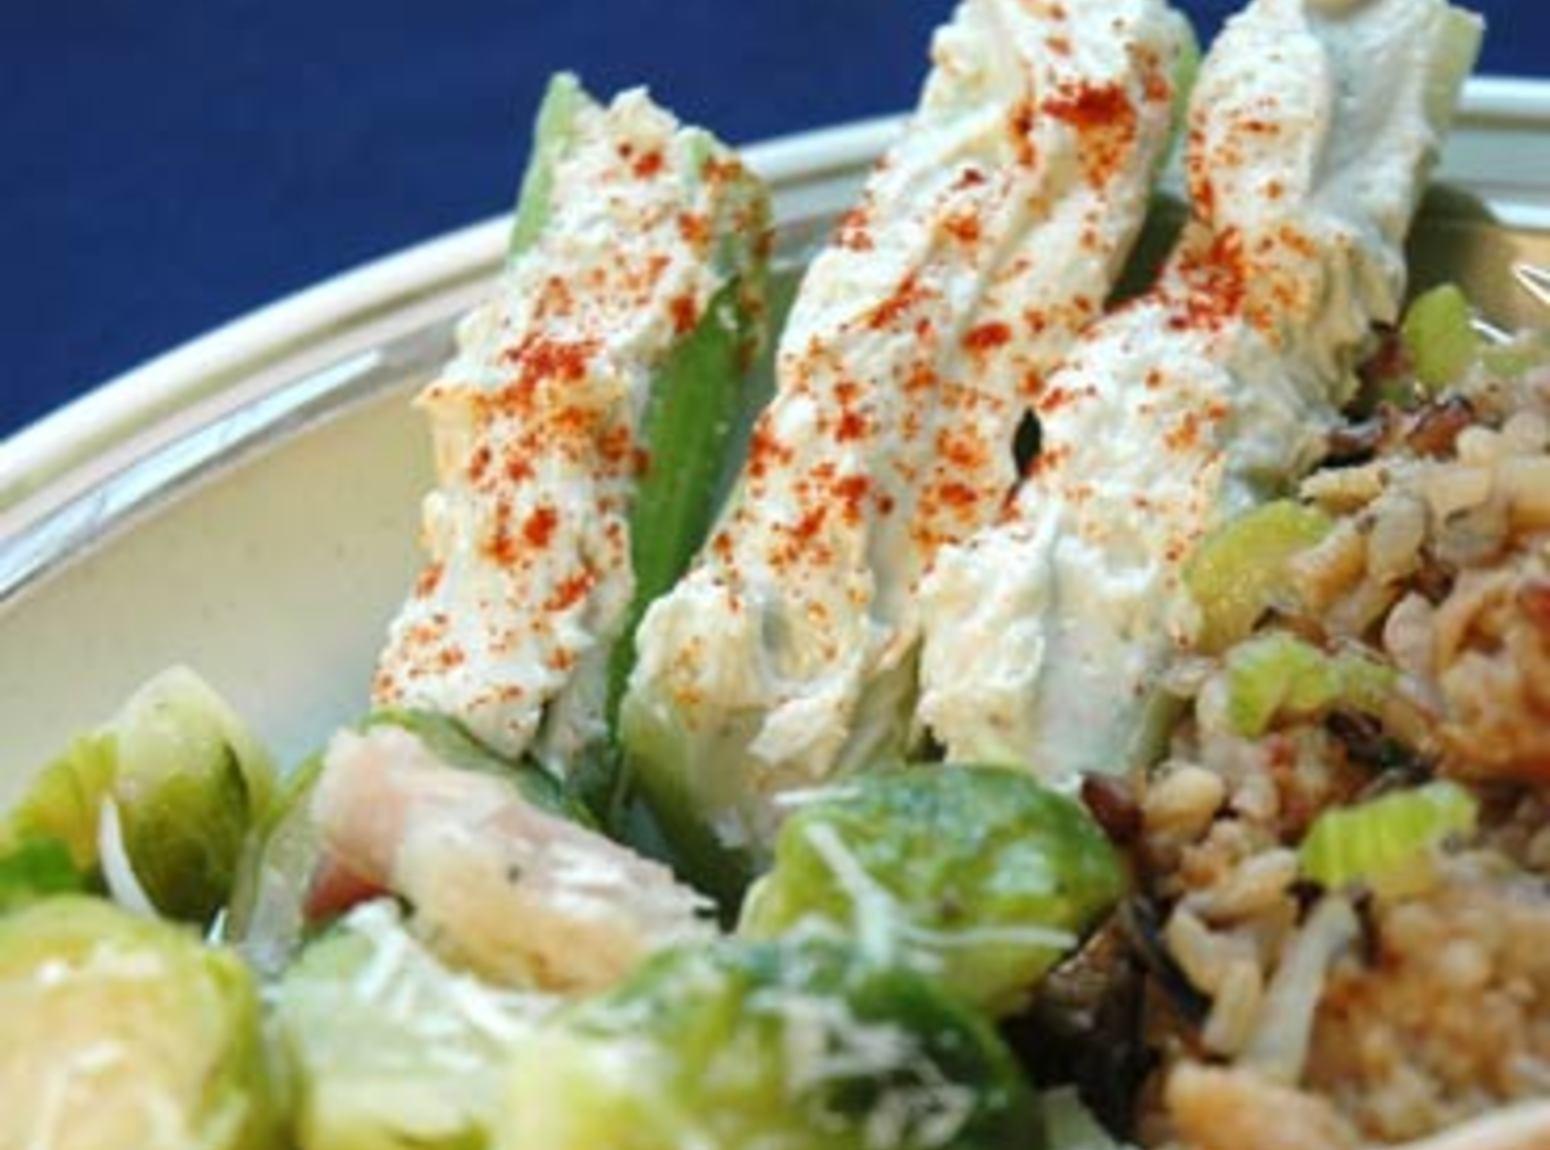 Stuffed Celery Appetizers Recipe